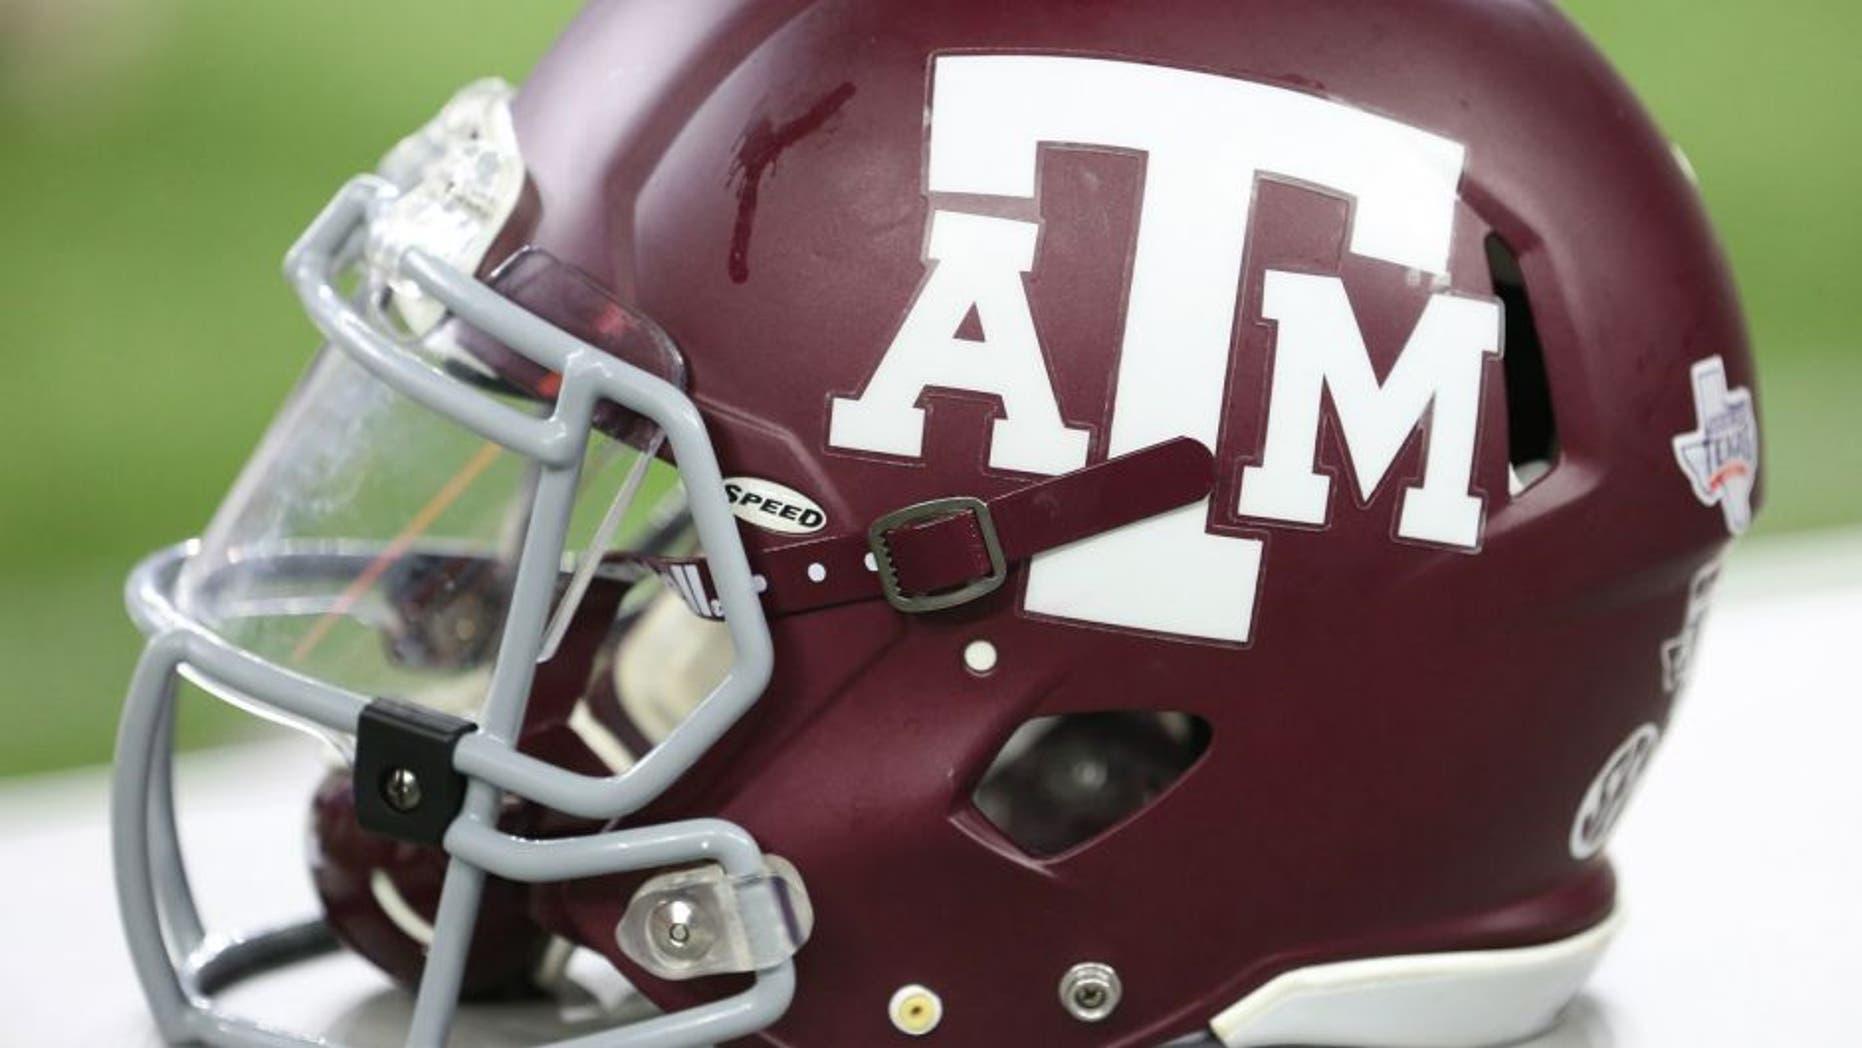 Sep 5, 2015; Houston, TX, USA; A view of a Texas A&M Aggies helmet at NRG Stadium. Aggies won 38 to 17. Mandatory Credit: Thomas B. Shea-USA TODAY Sports